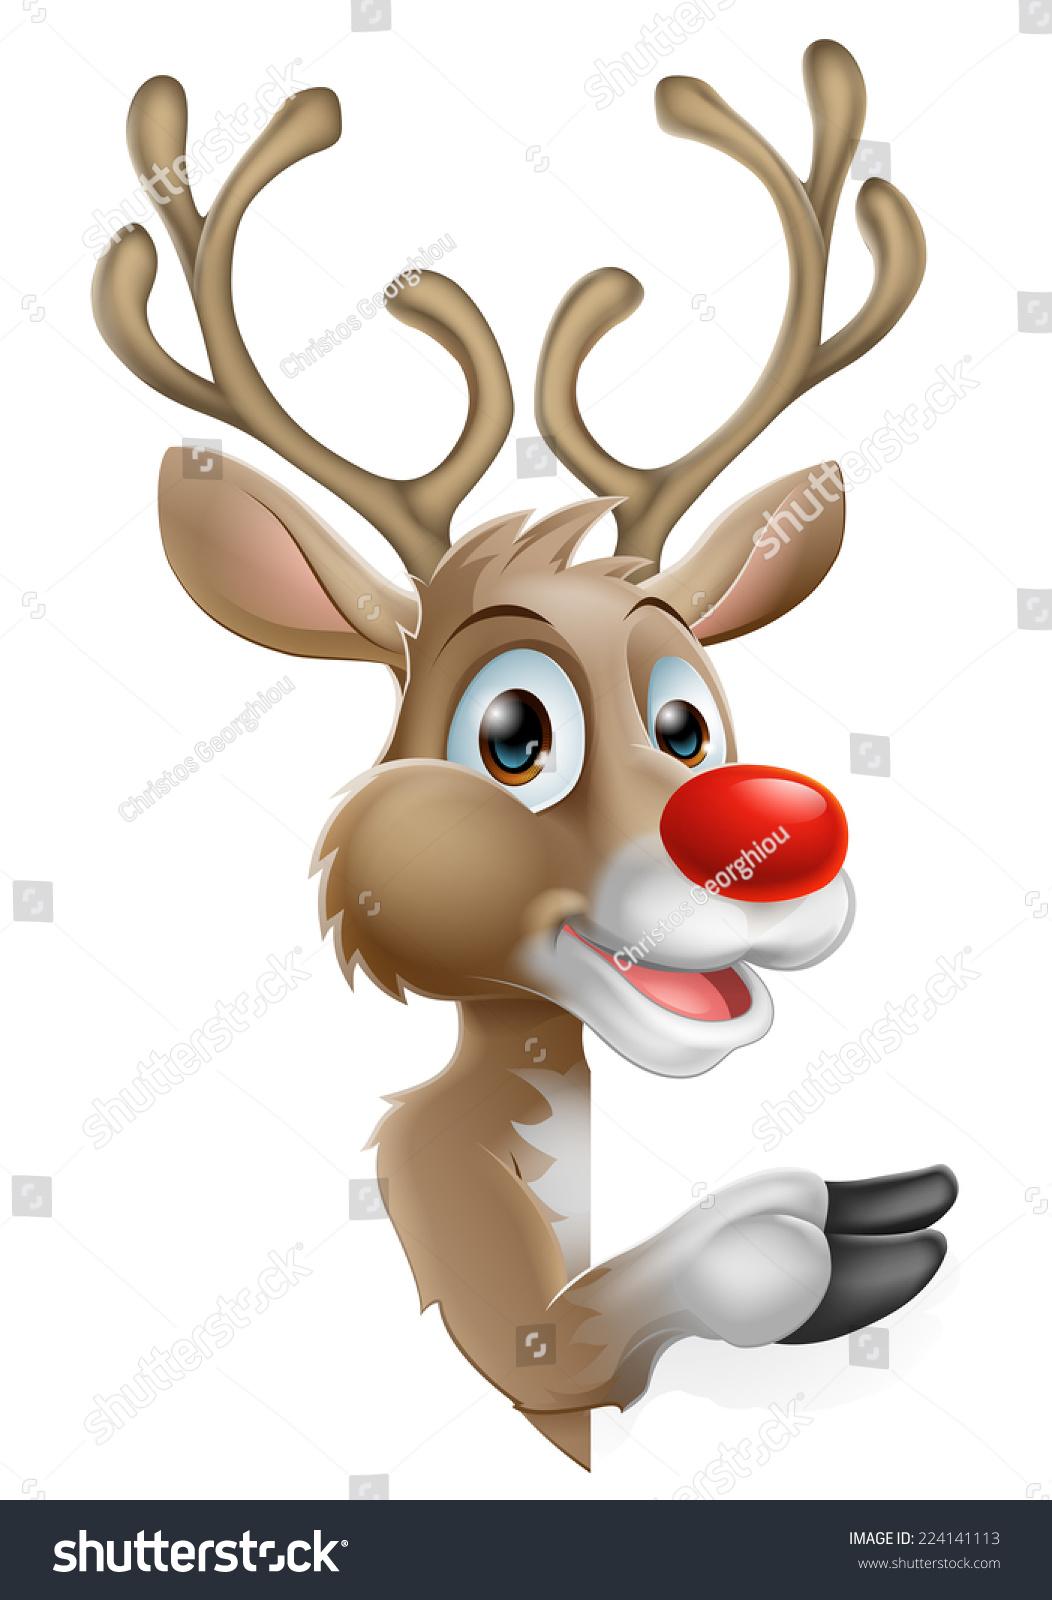 Cartoon santas christmas reindeer peeking around a sign